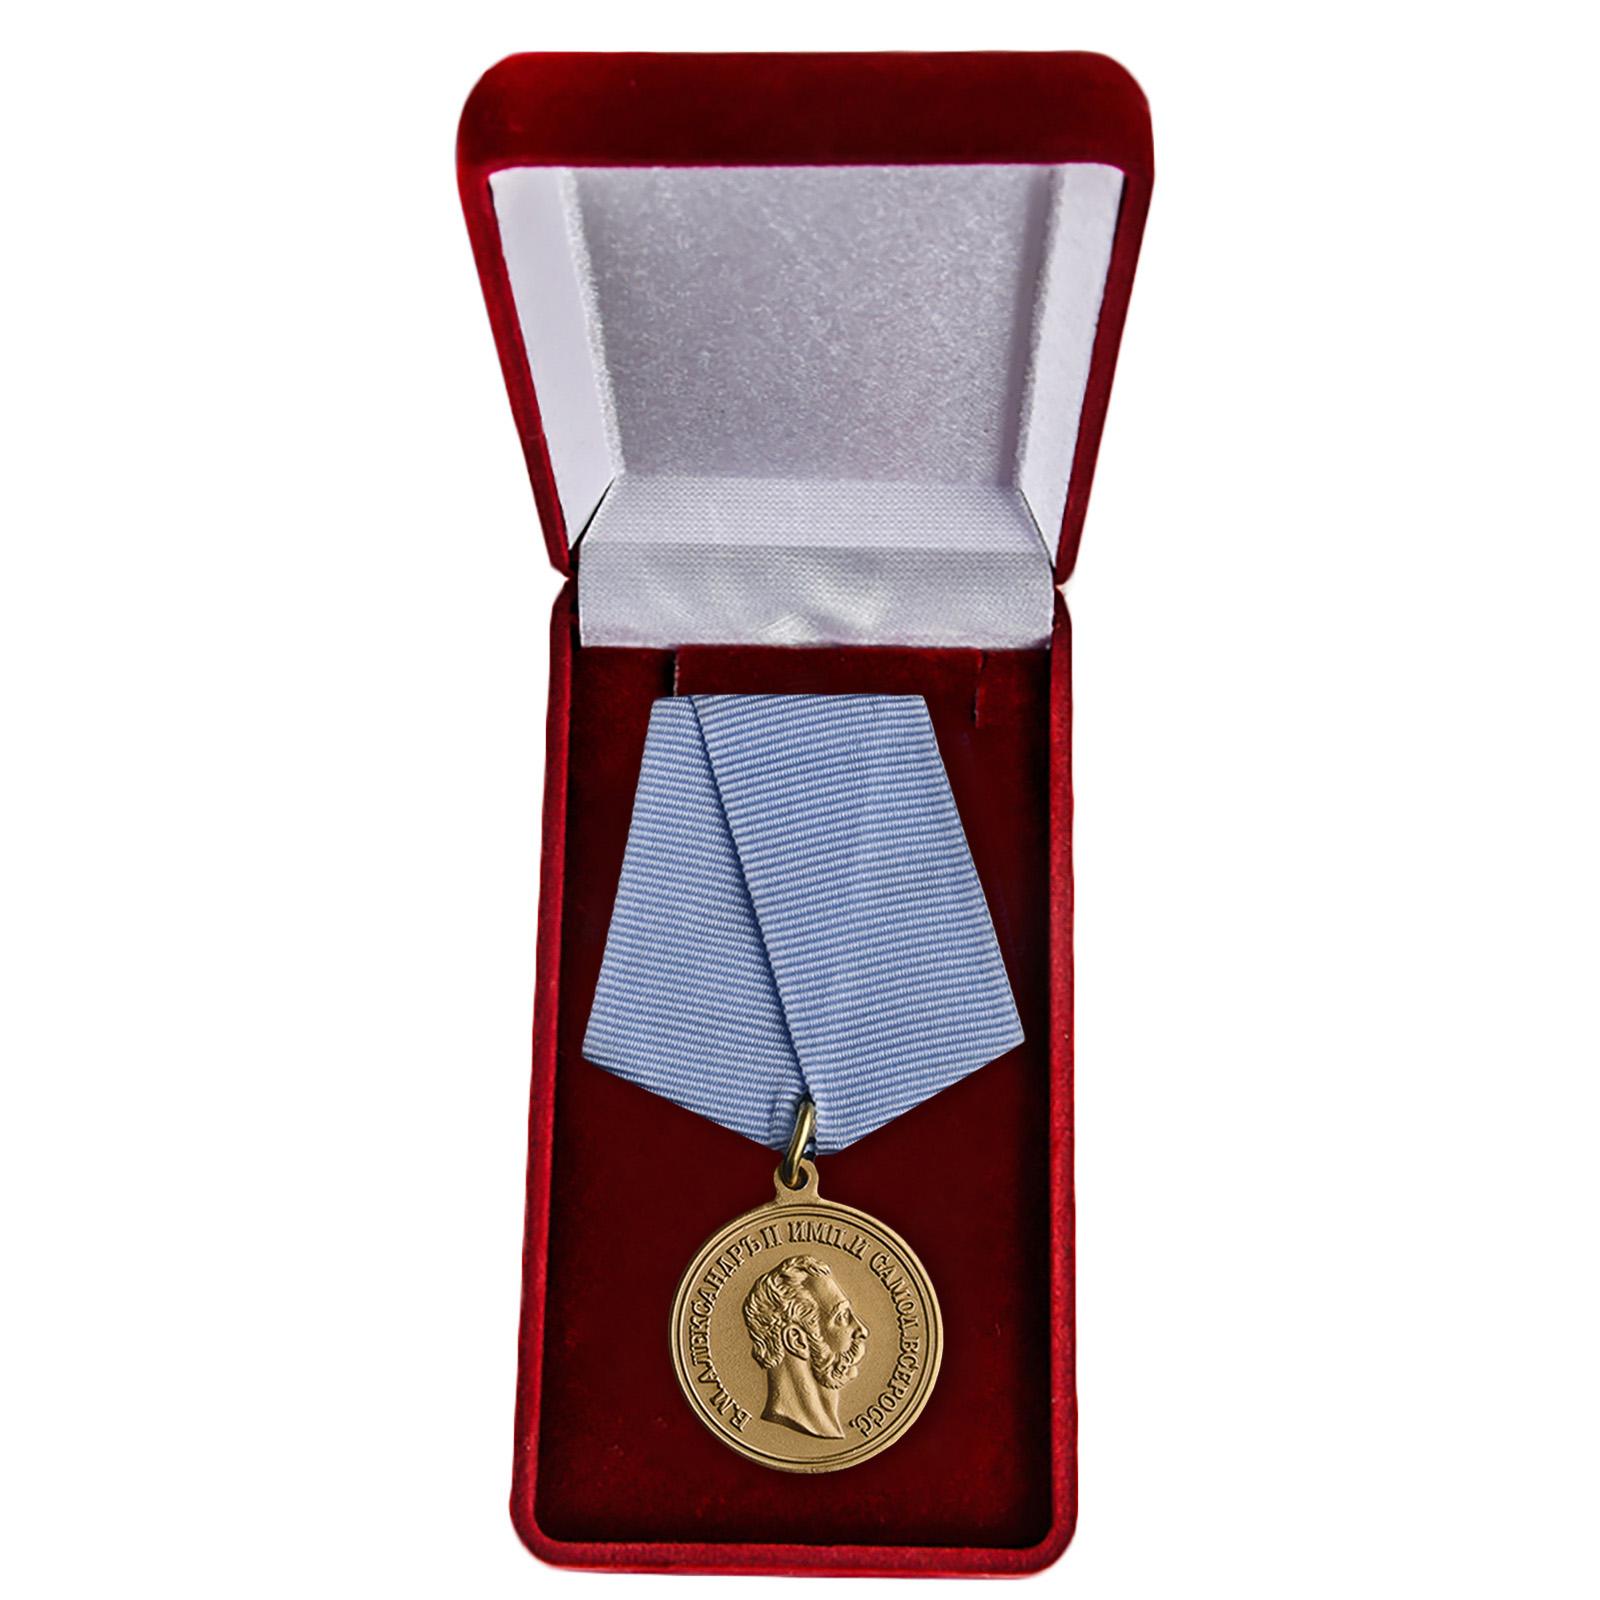 Памятная медаль 4 апреля 1866 года - в футляре